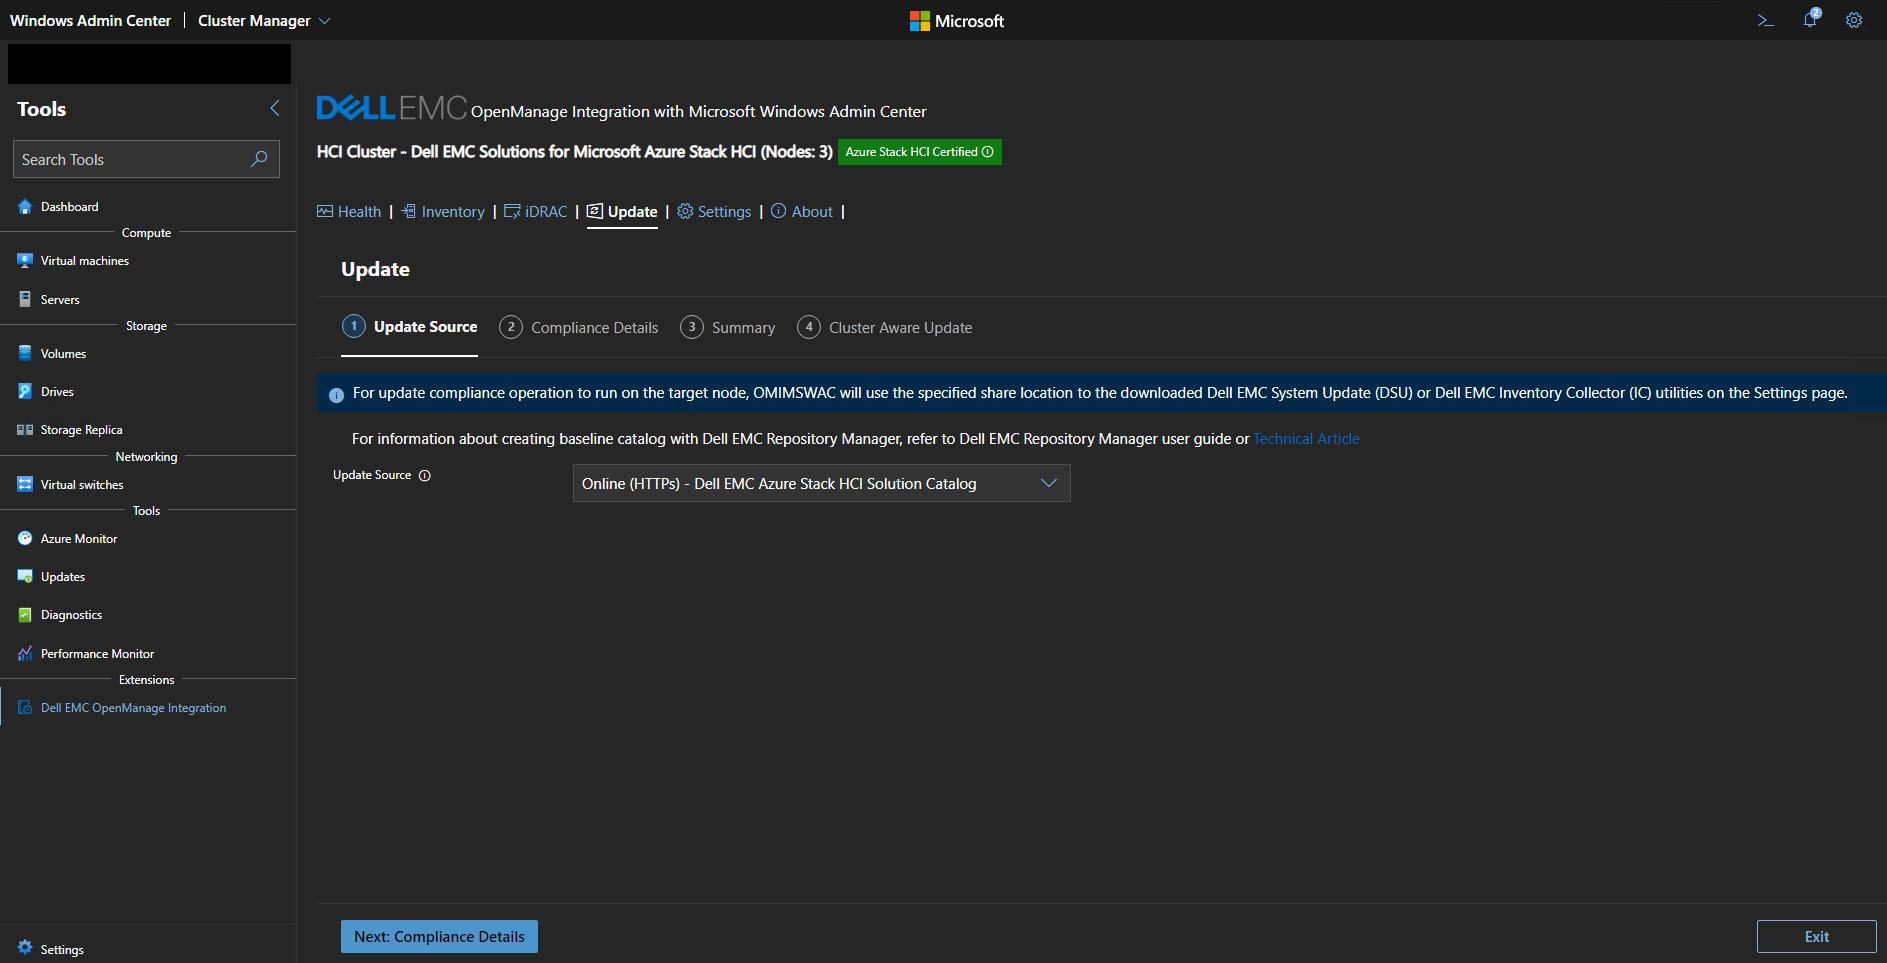 Online – Dell EMC Azure Stack HCI